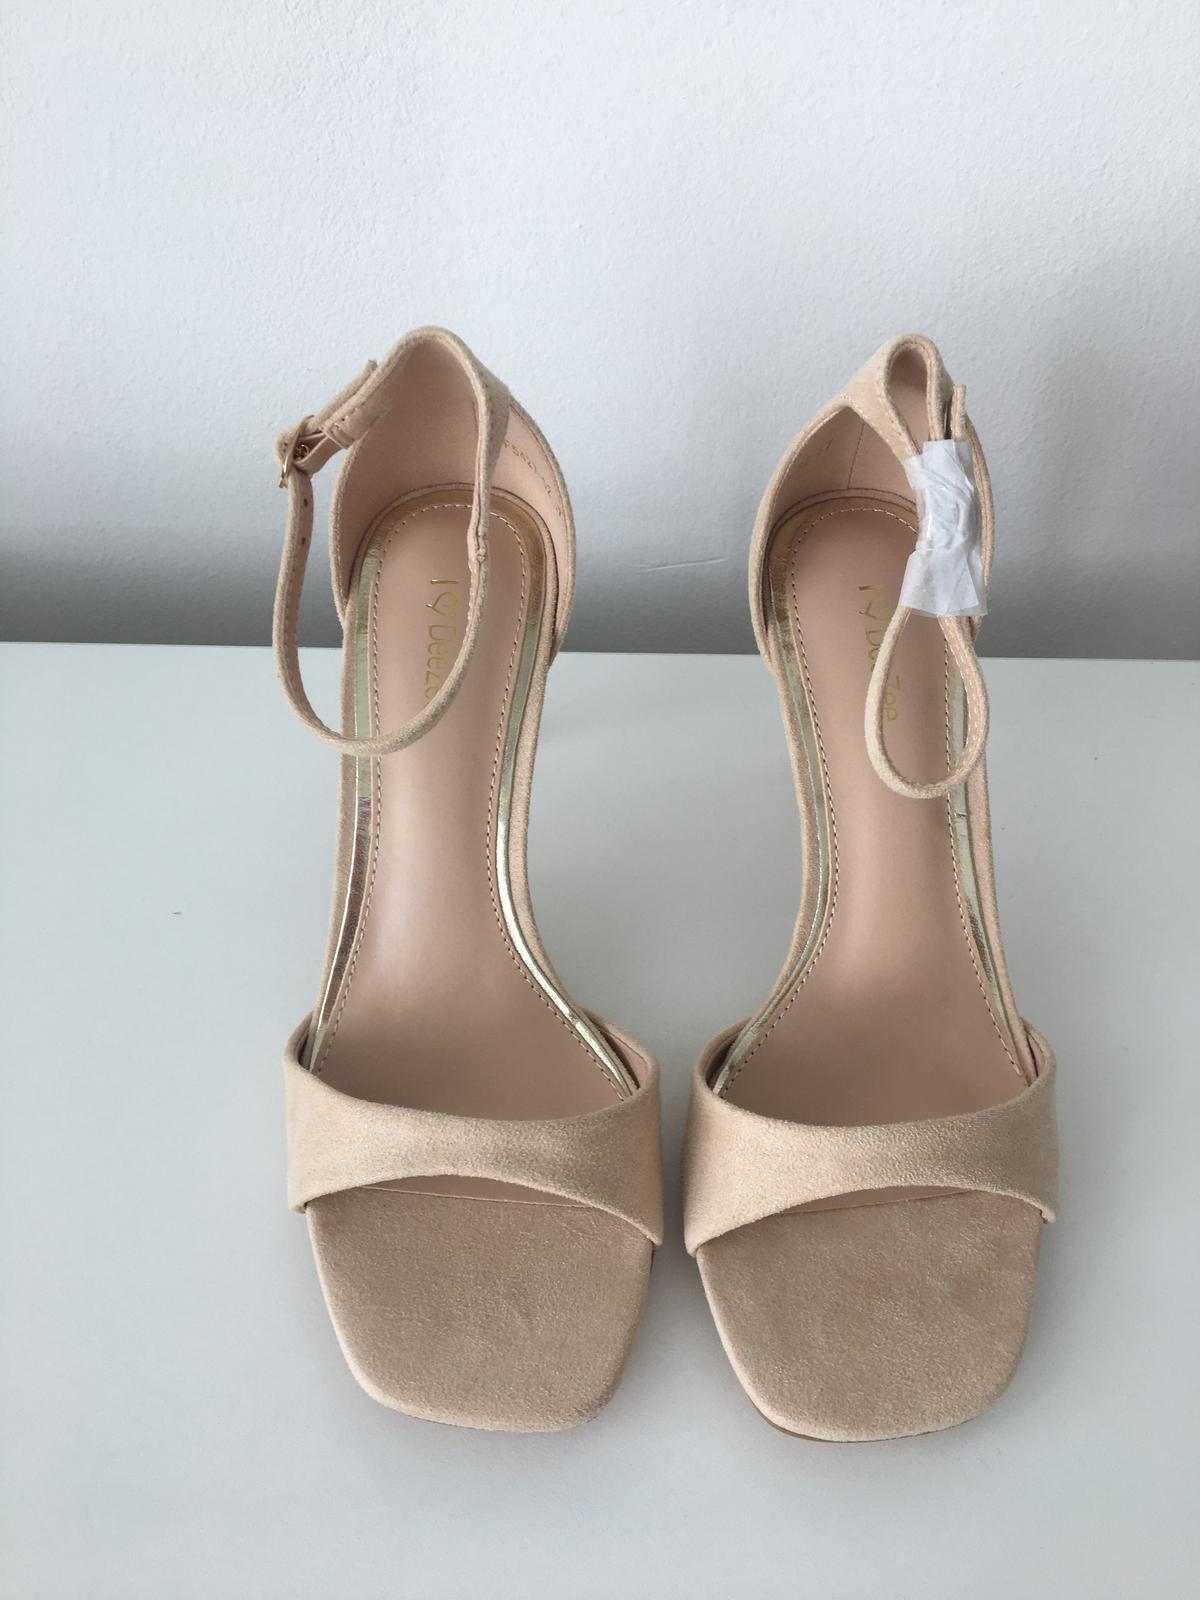 Béžové sandálky - Obrázok č. 1